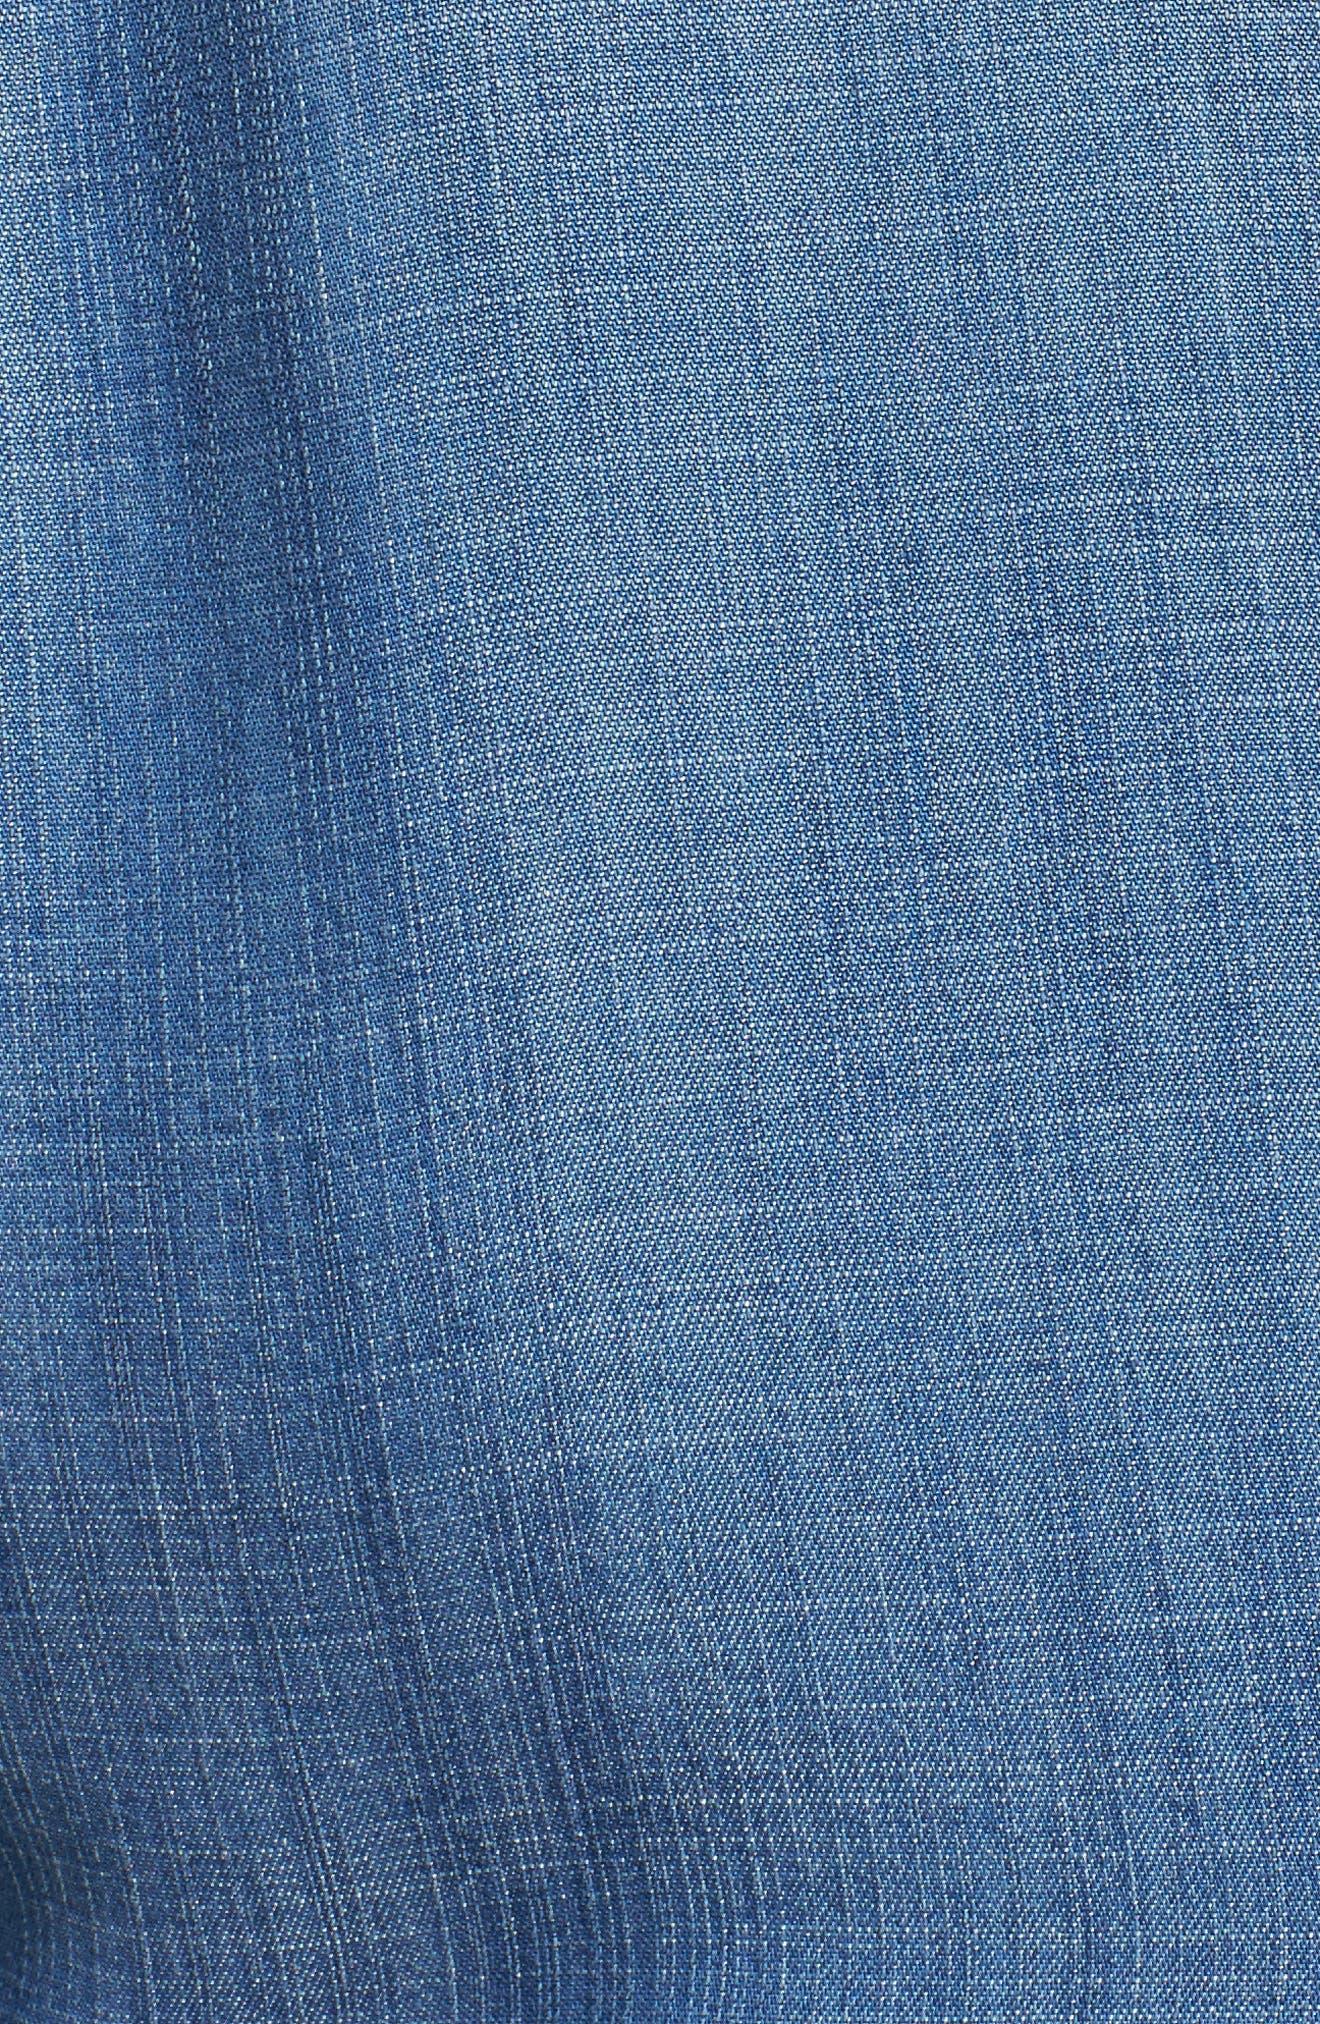 Alternate Image 5  - Caslon® Peplum Denim Shirt (Plus Size)